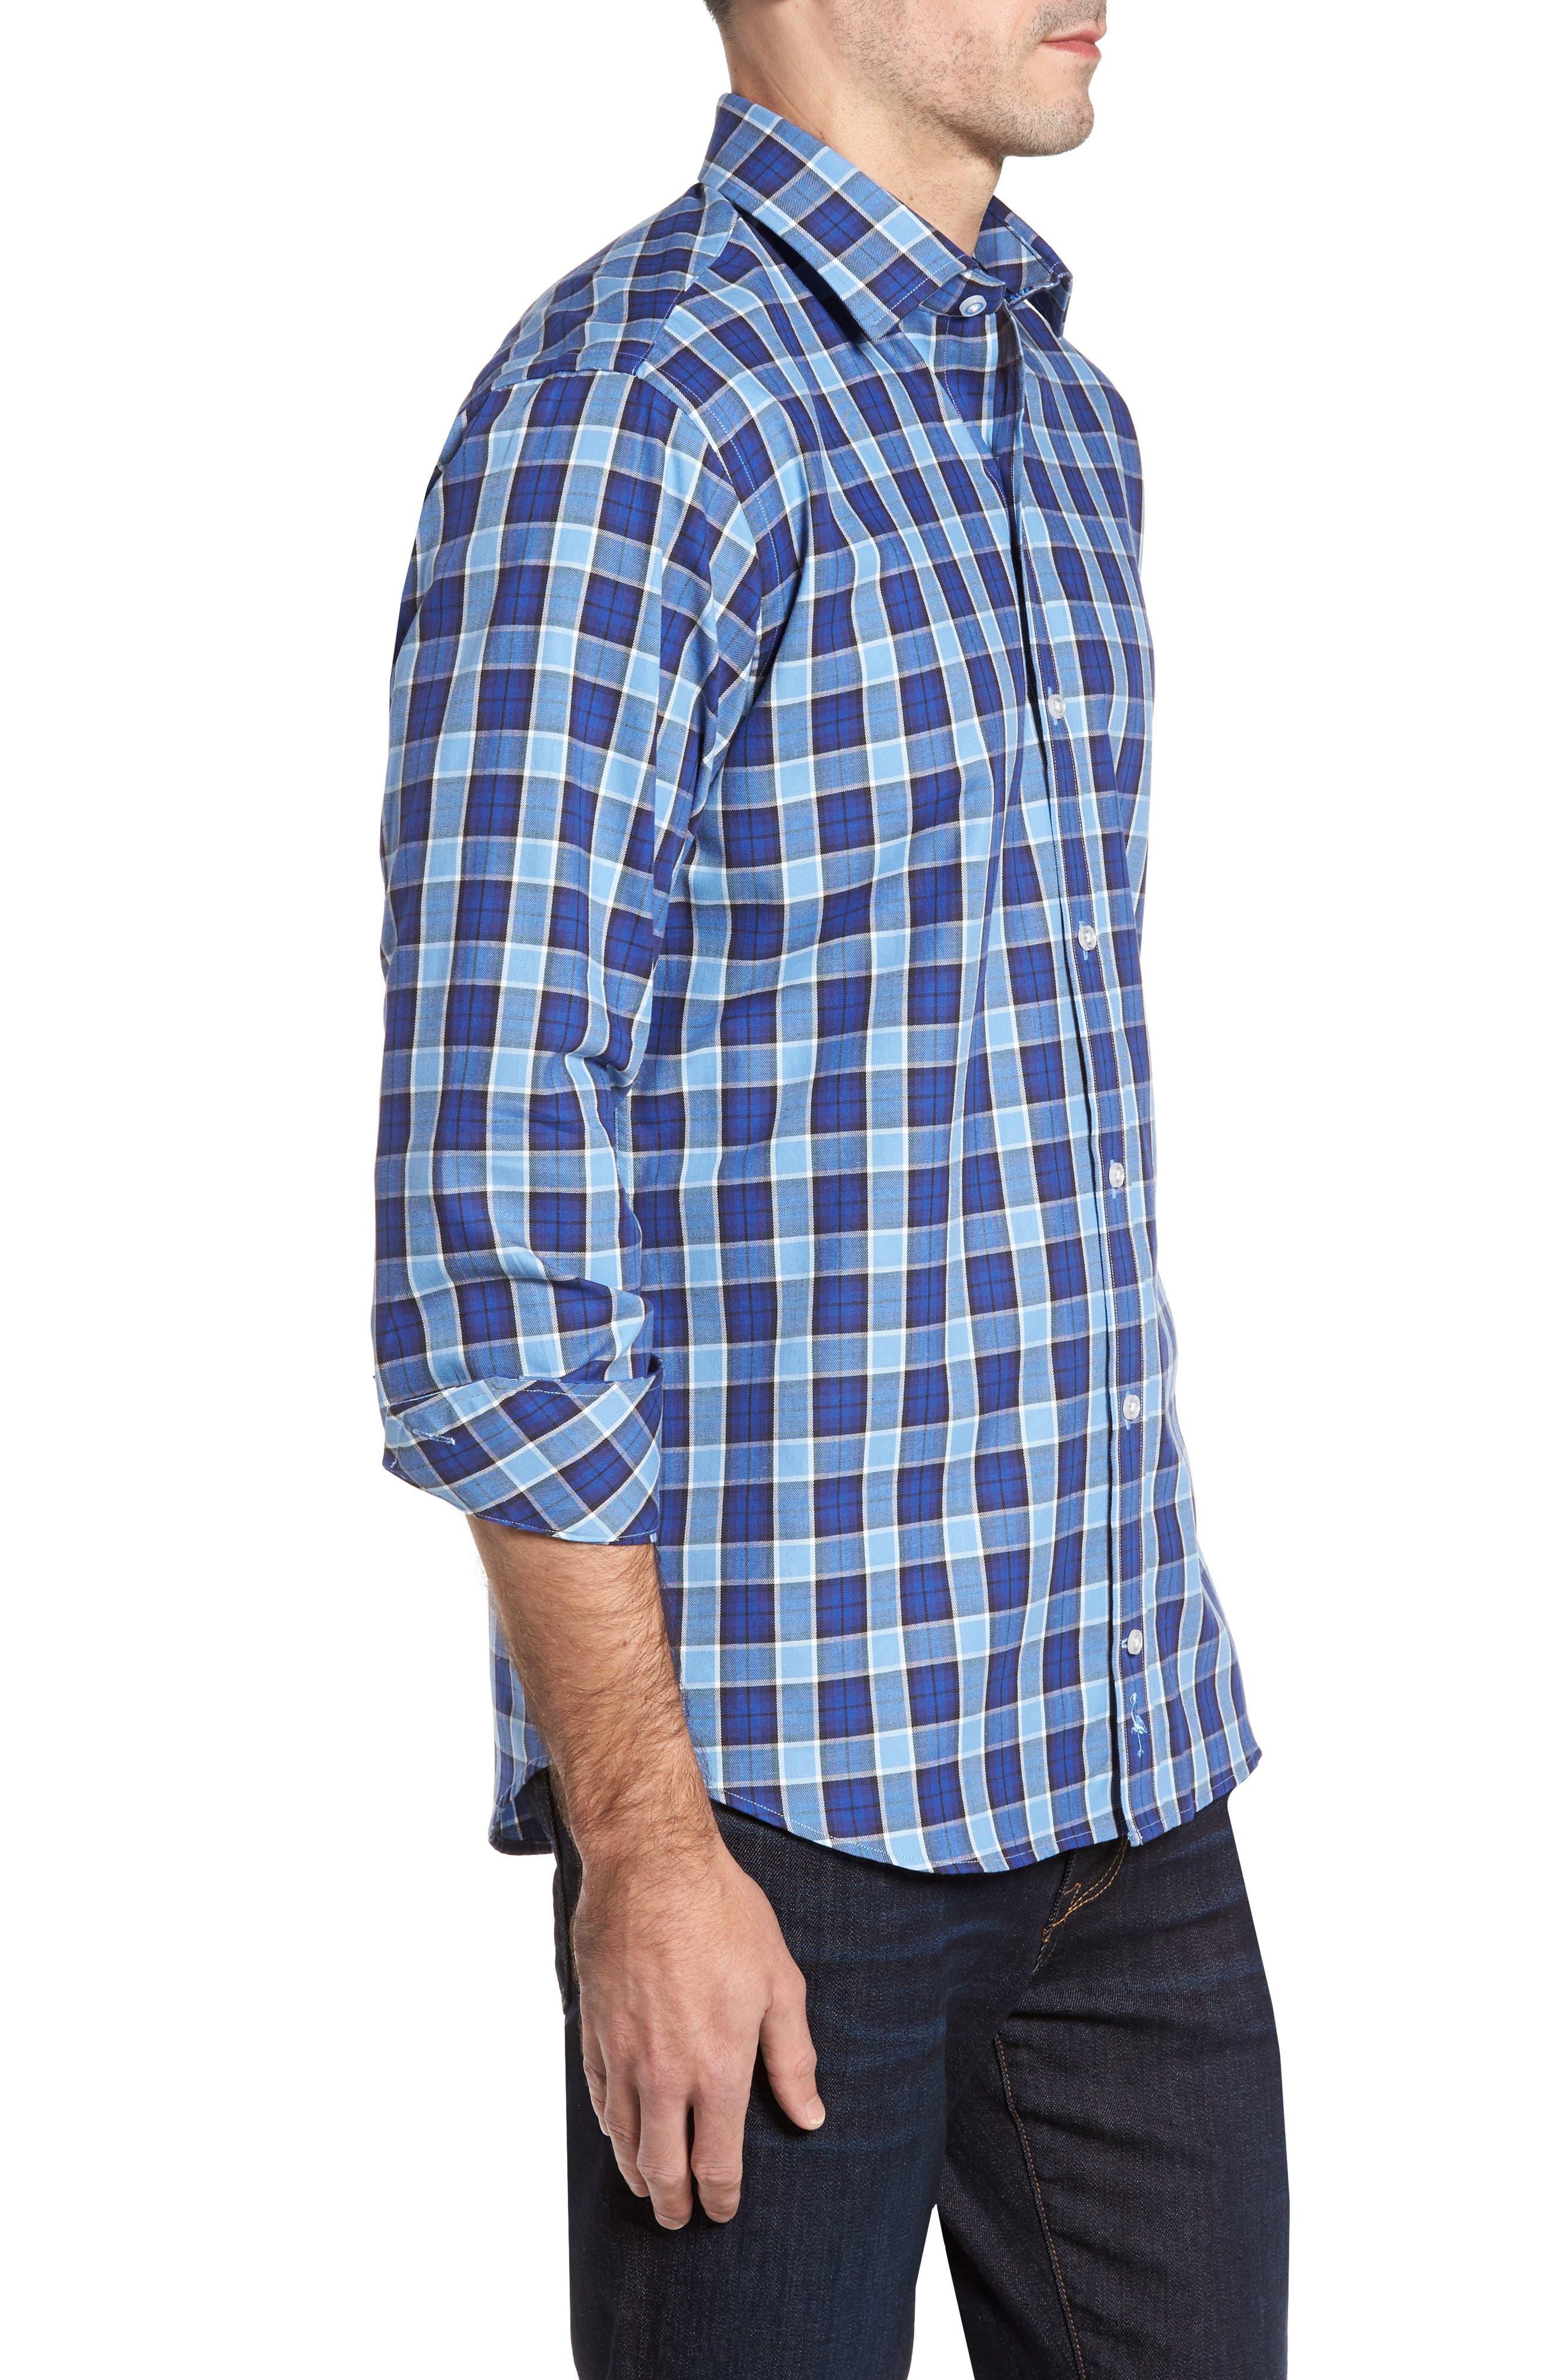 Alternate Image 3  - TailorByrd Brownsville Windowpane Check Twill Sport Shirt